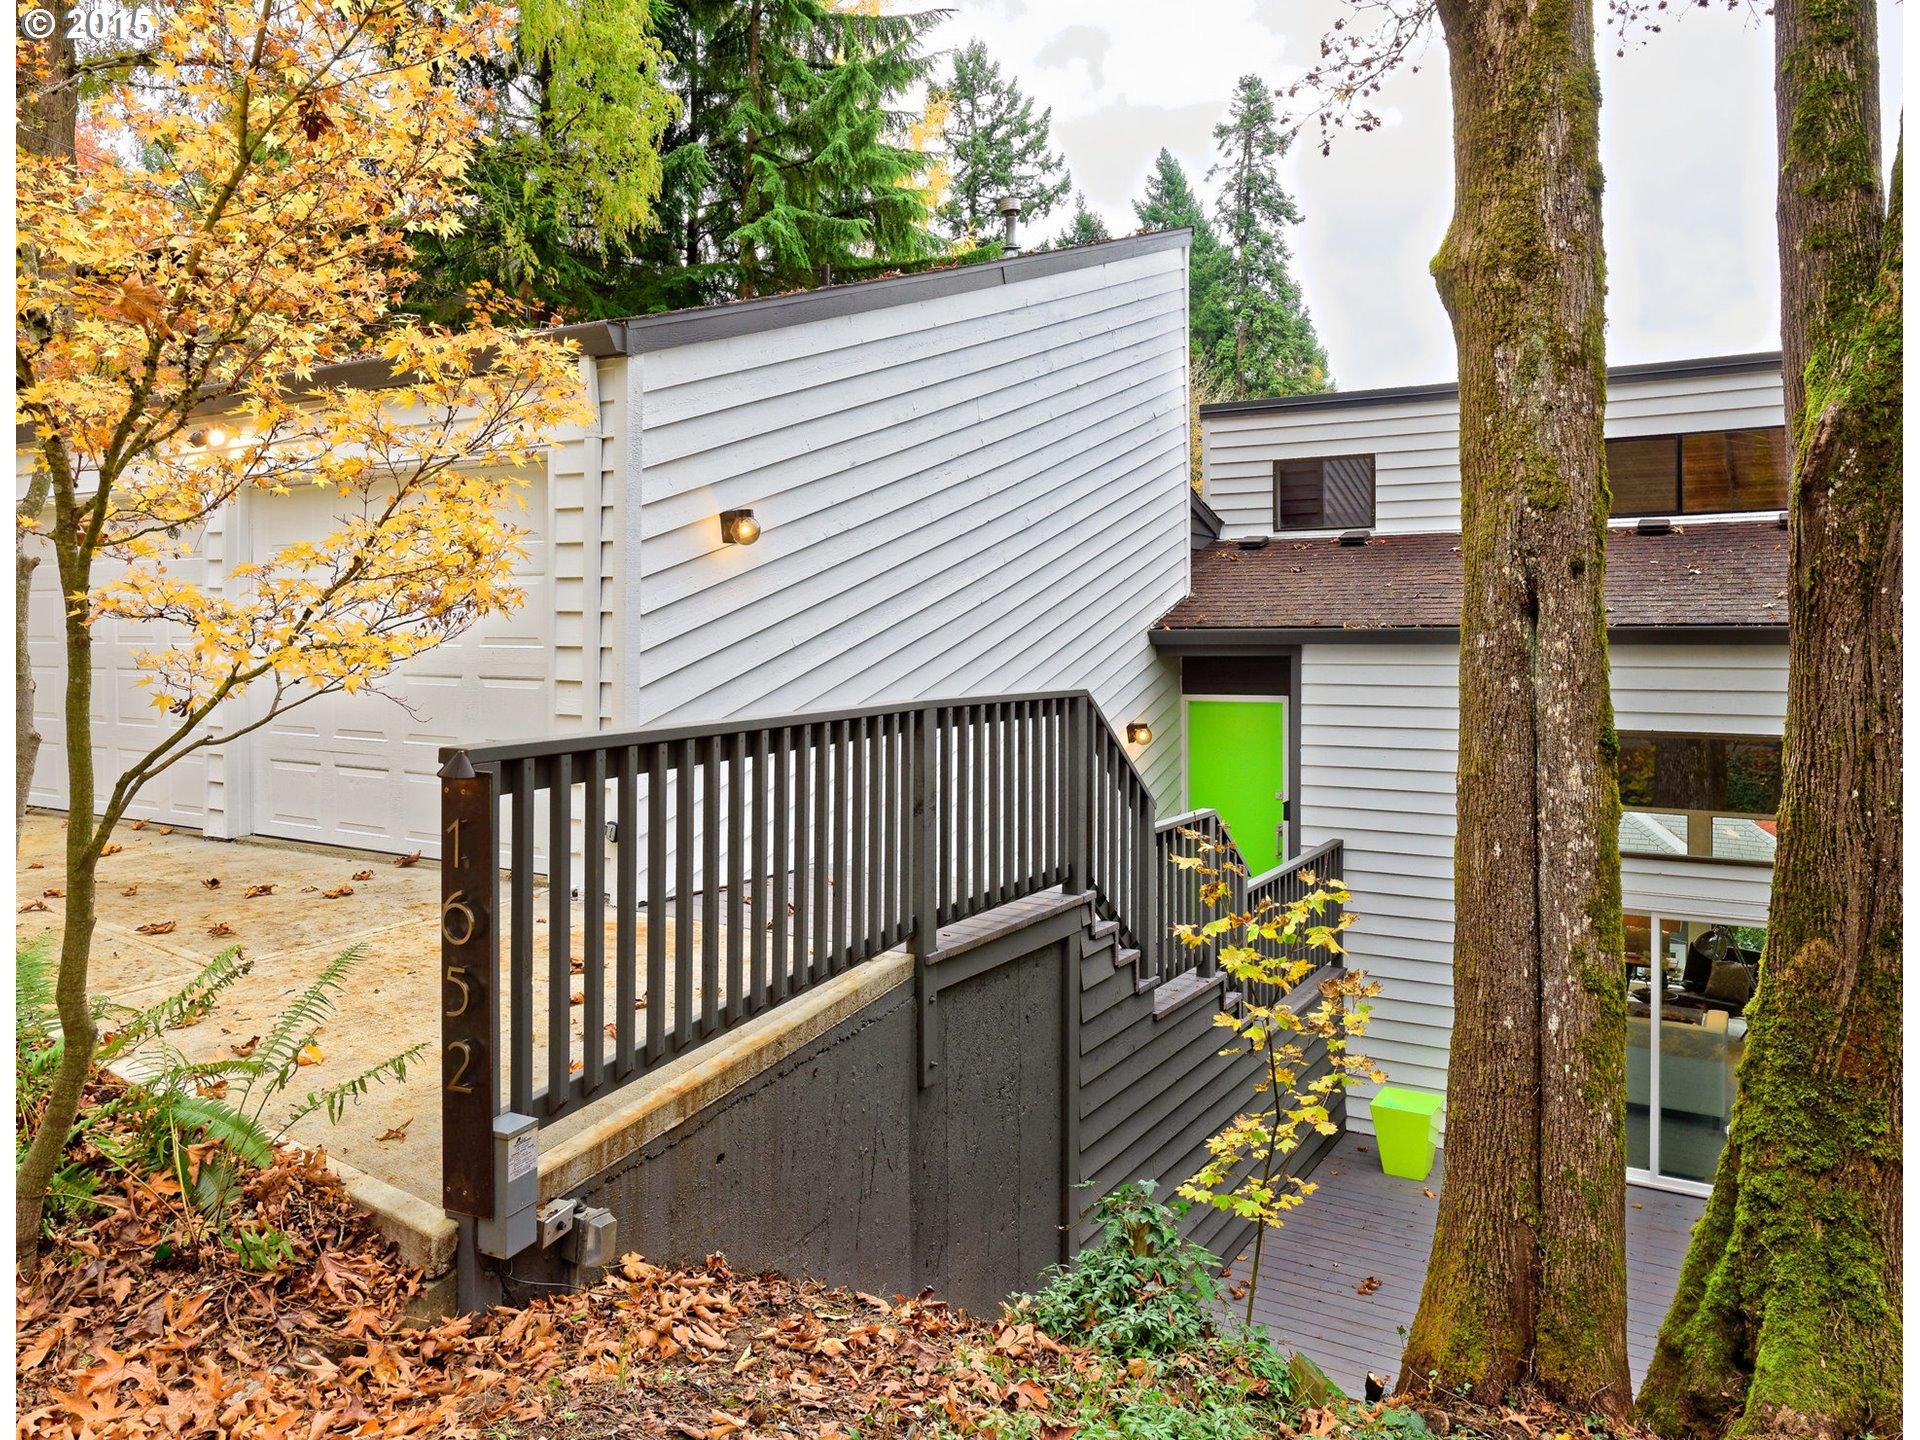 1652 SW DAVENPORT ST, Portland OR 97201